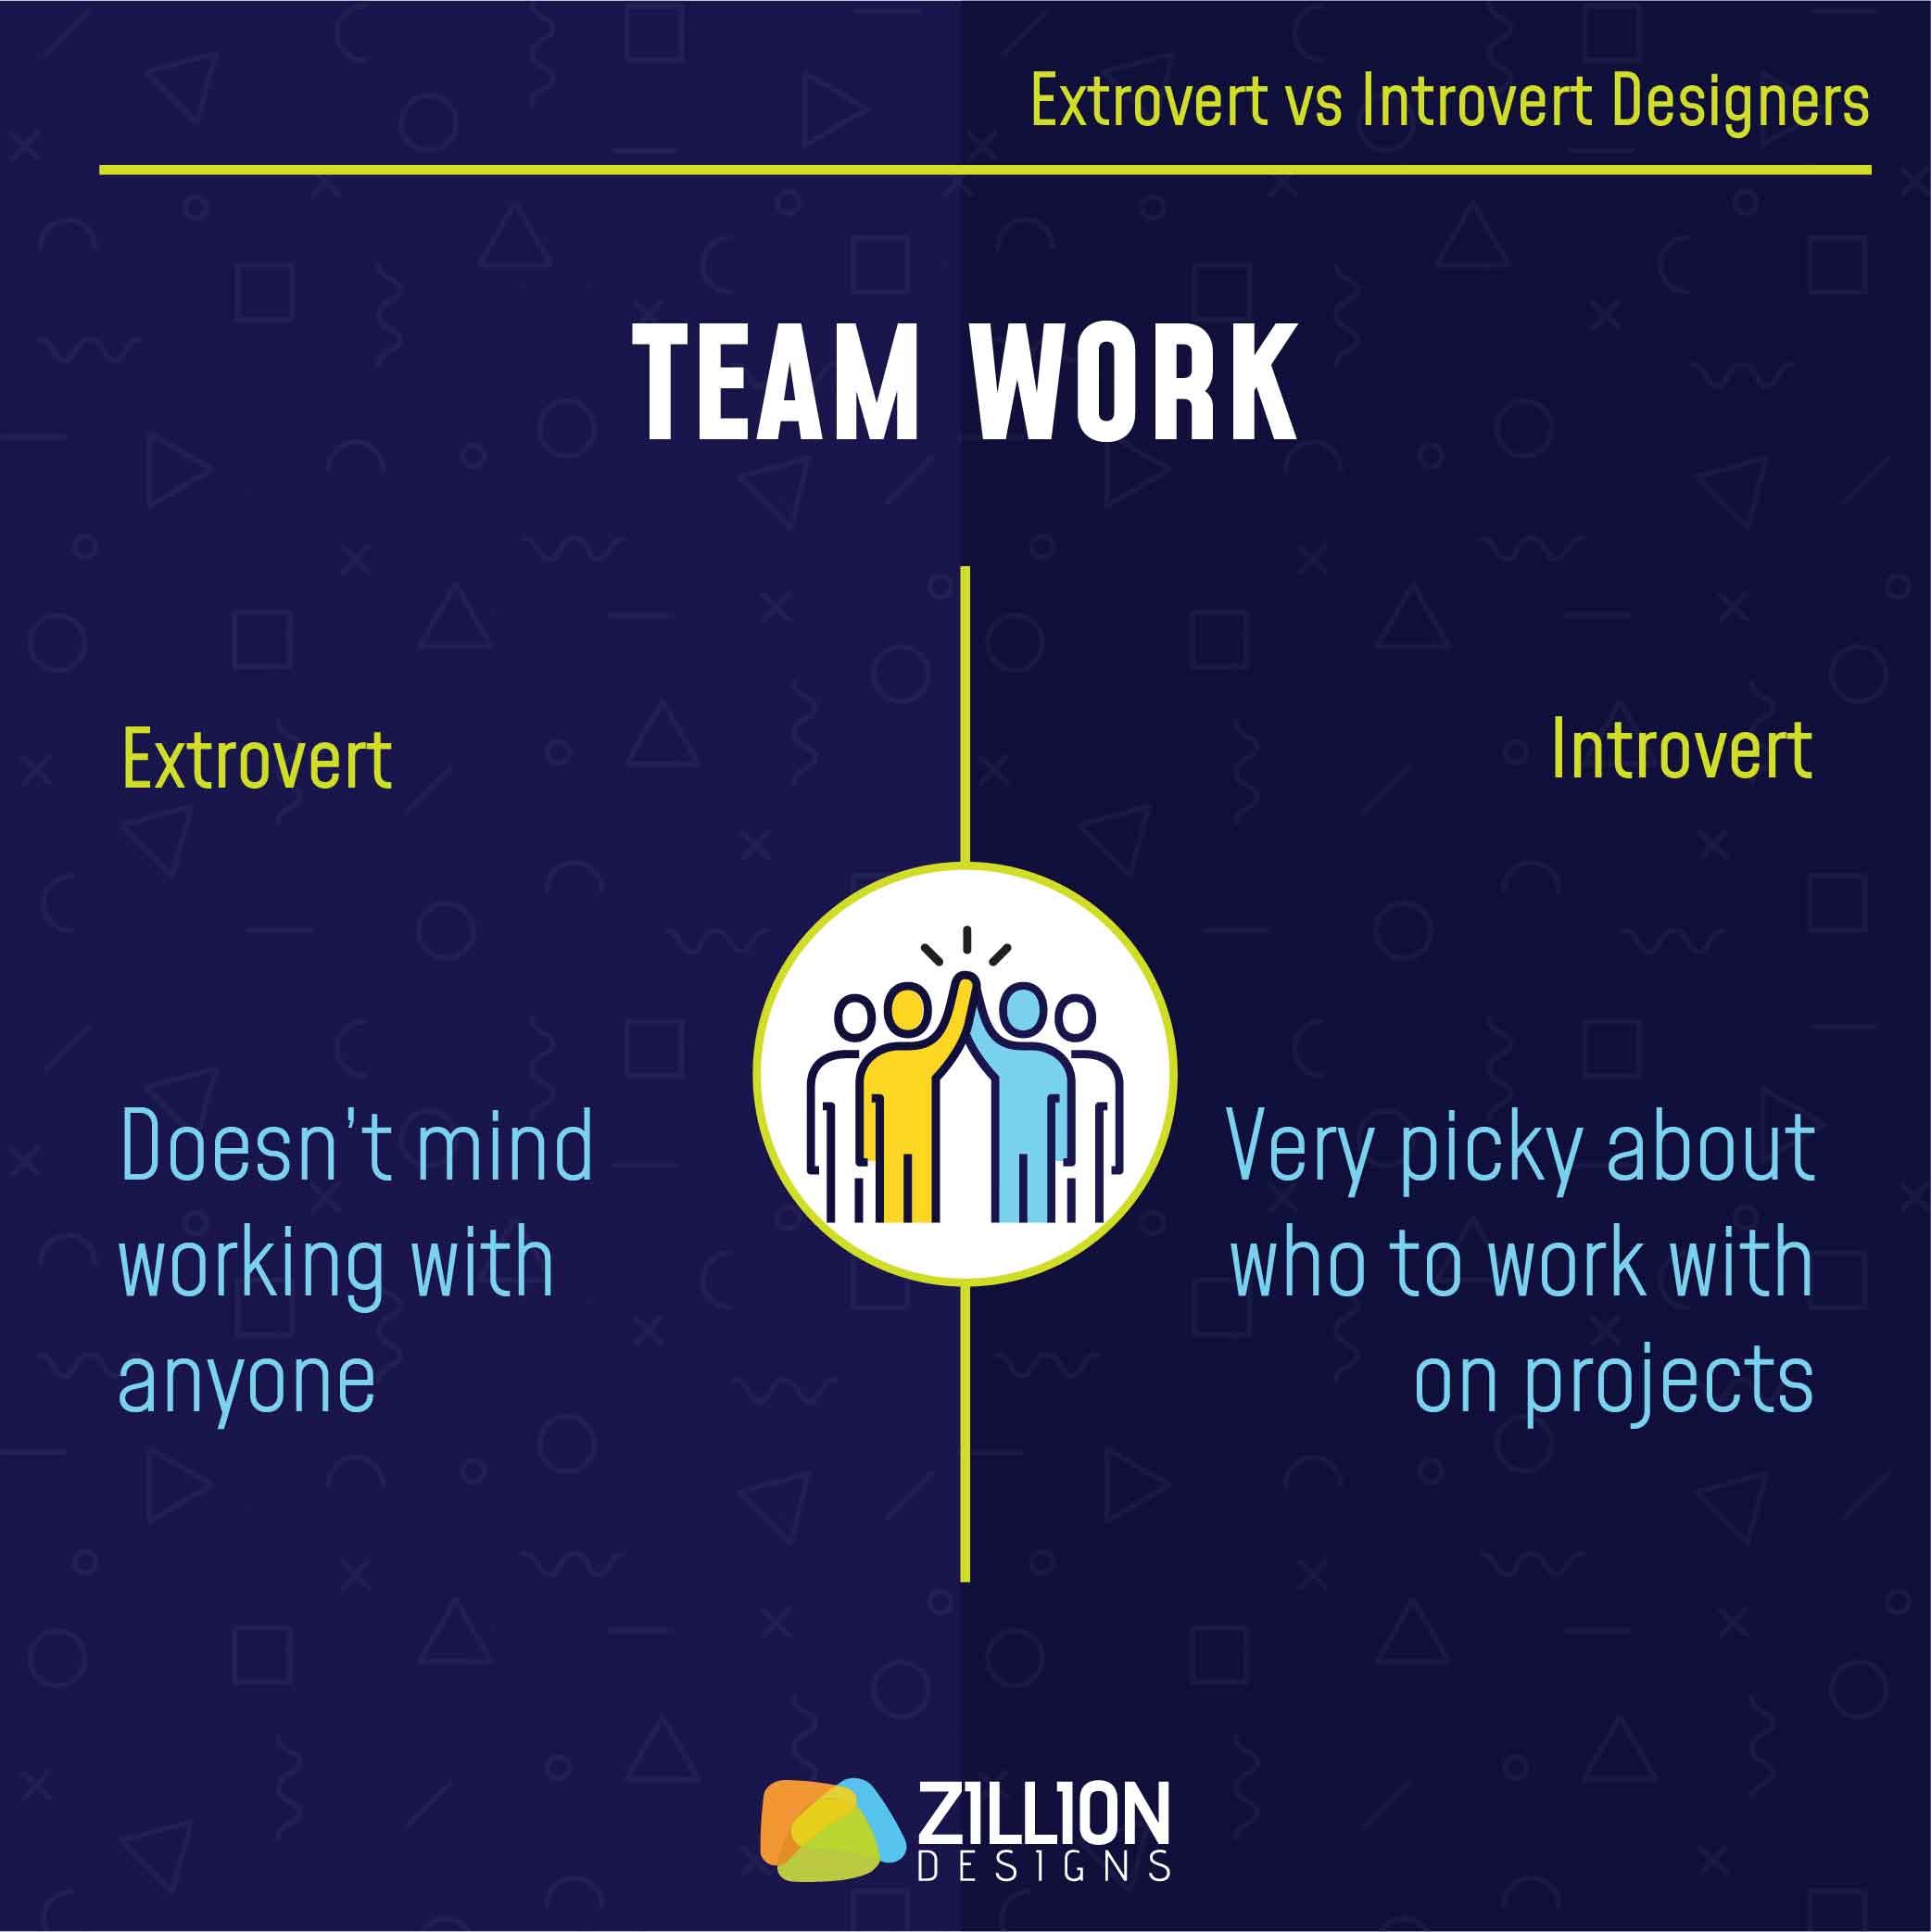 Extrovert vs Introvert Designers 5